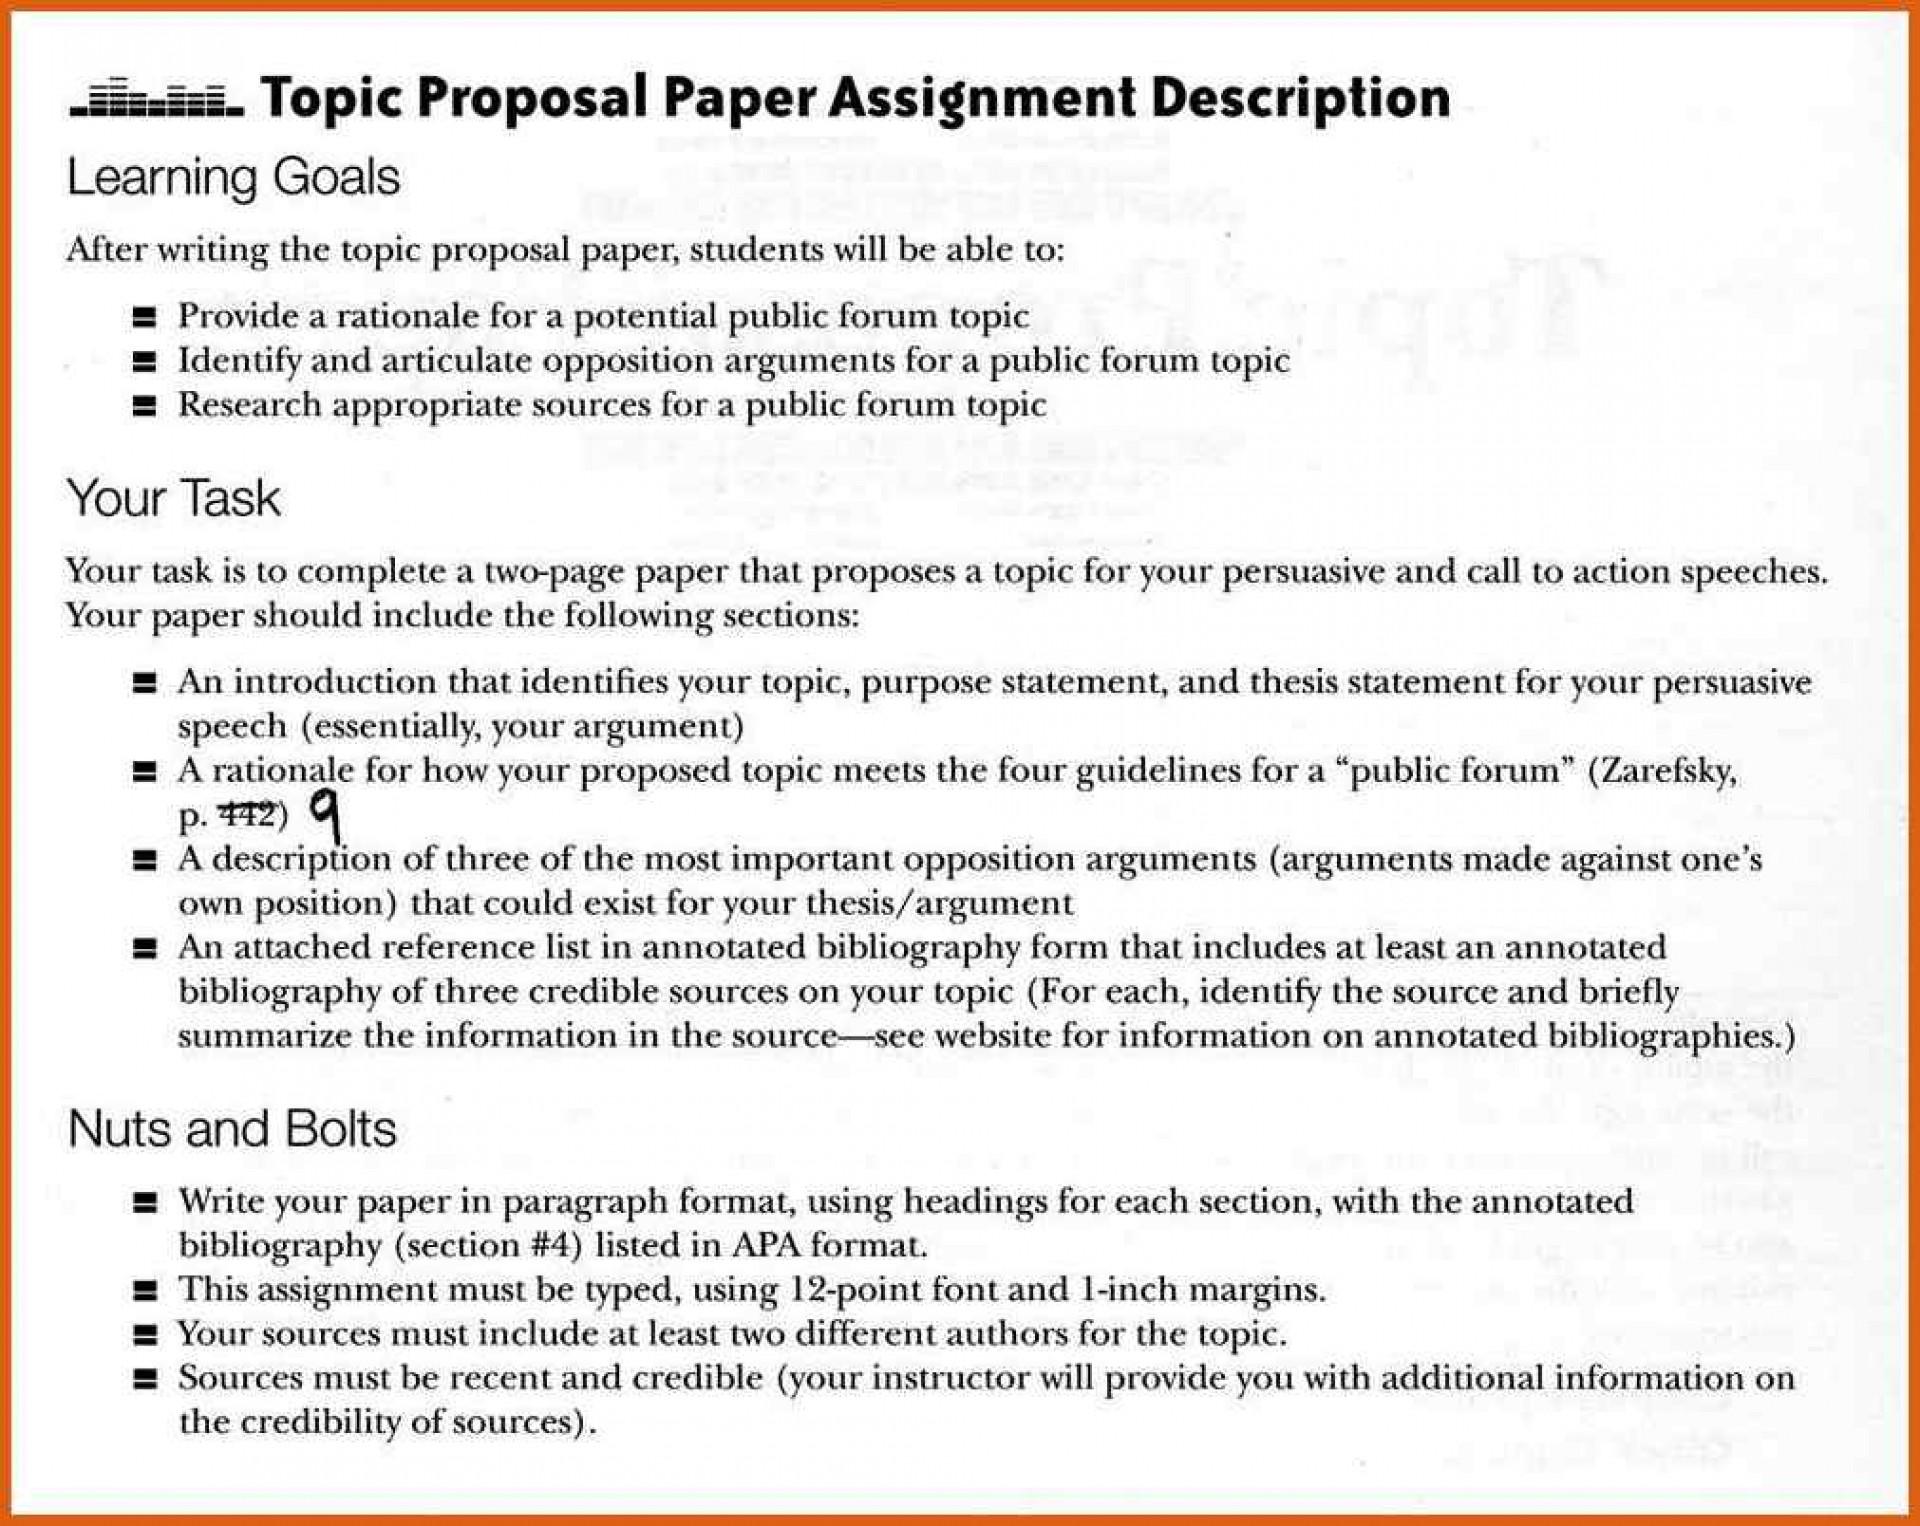 University of Washington's Essay Prompts | CollegeVine